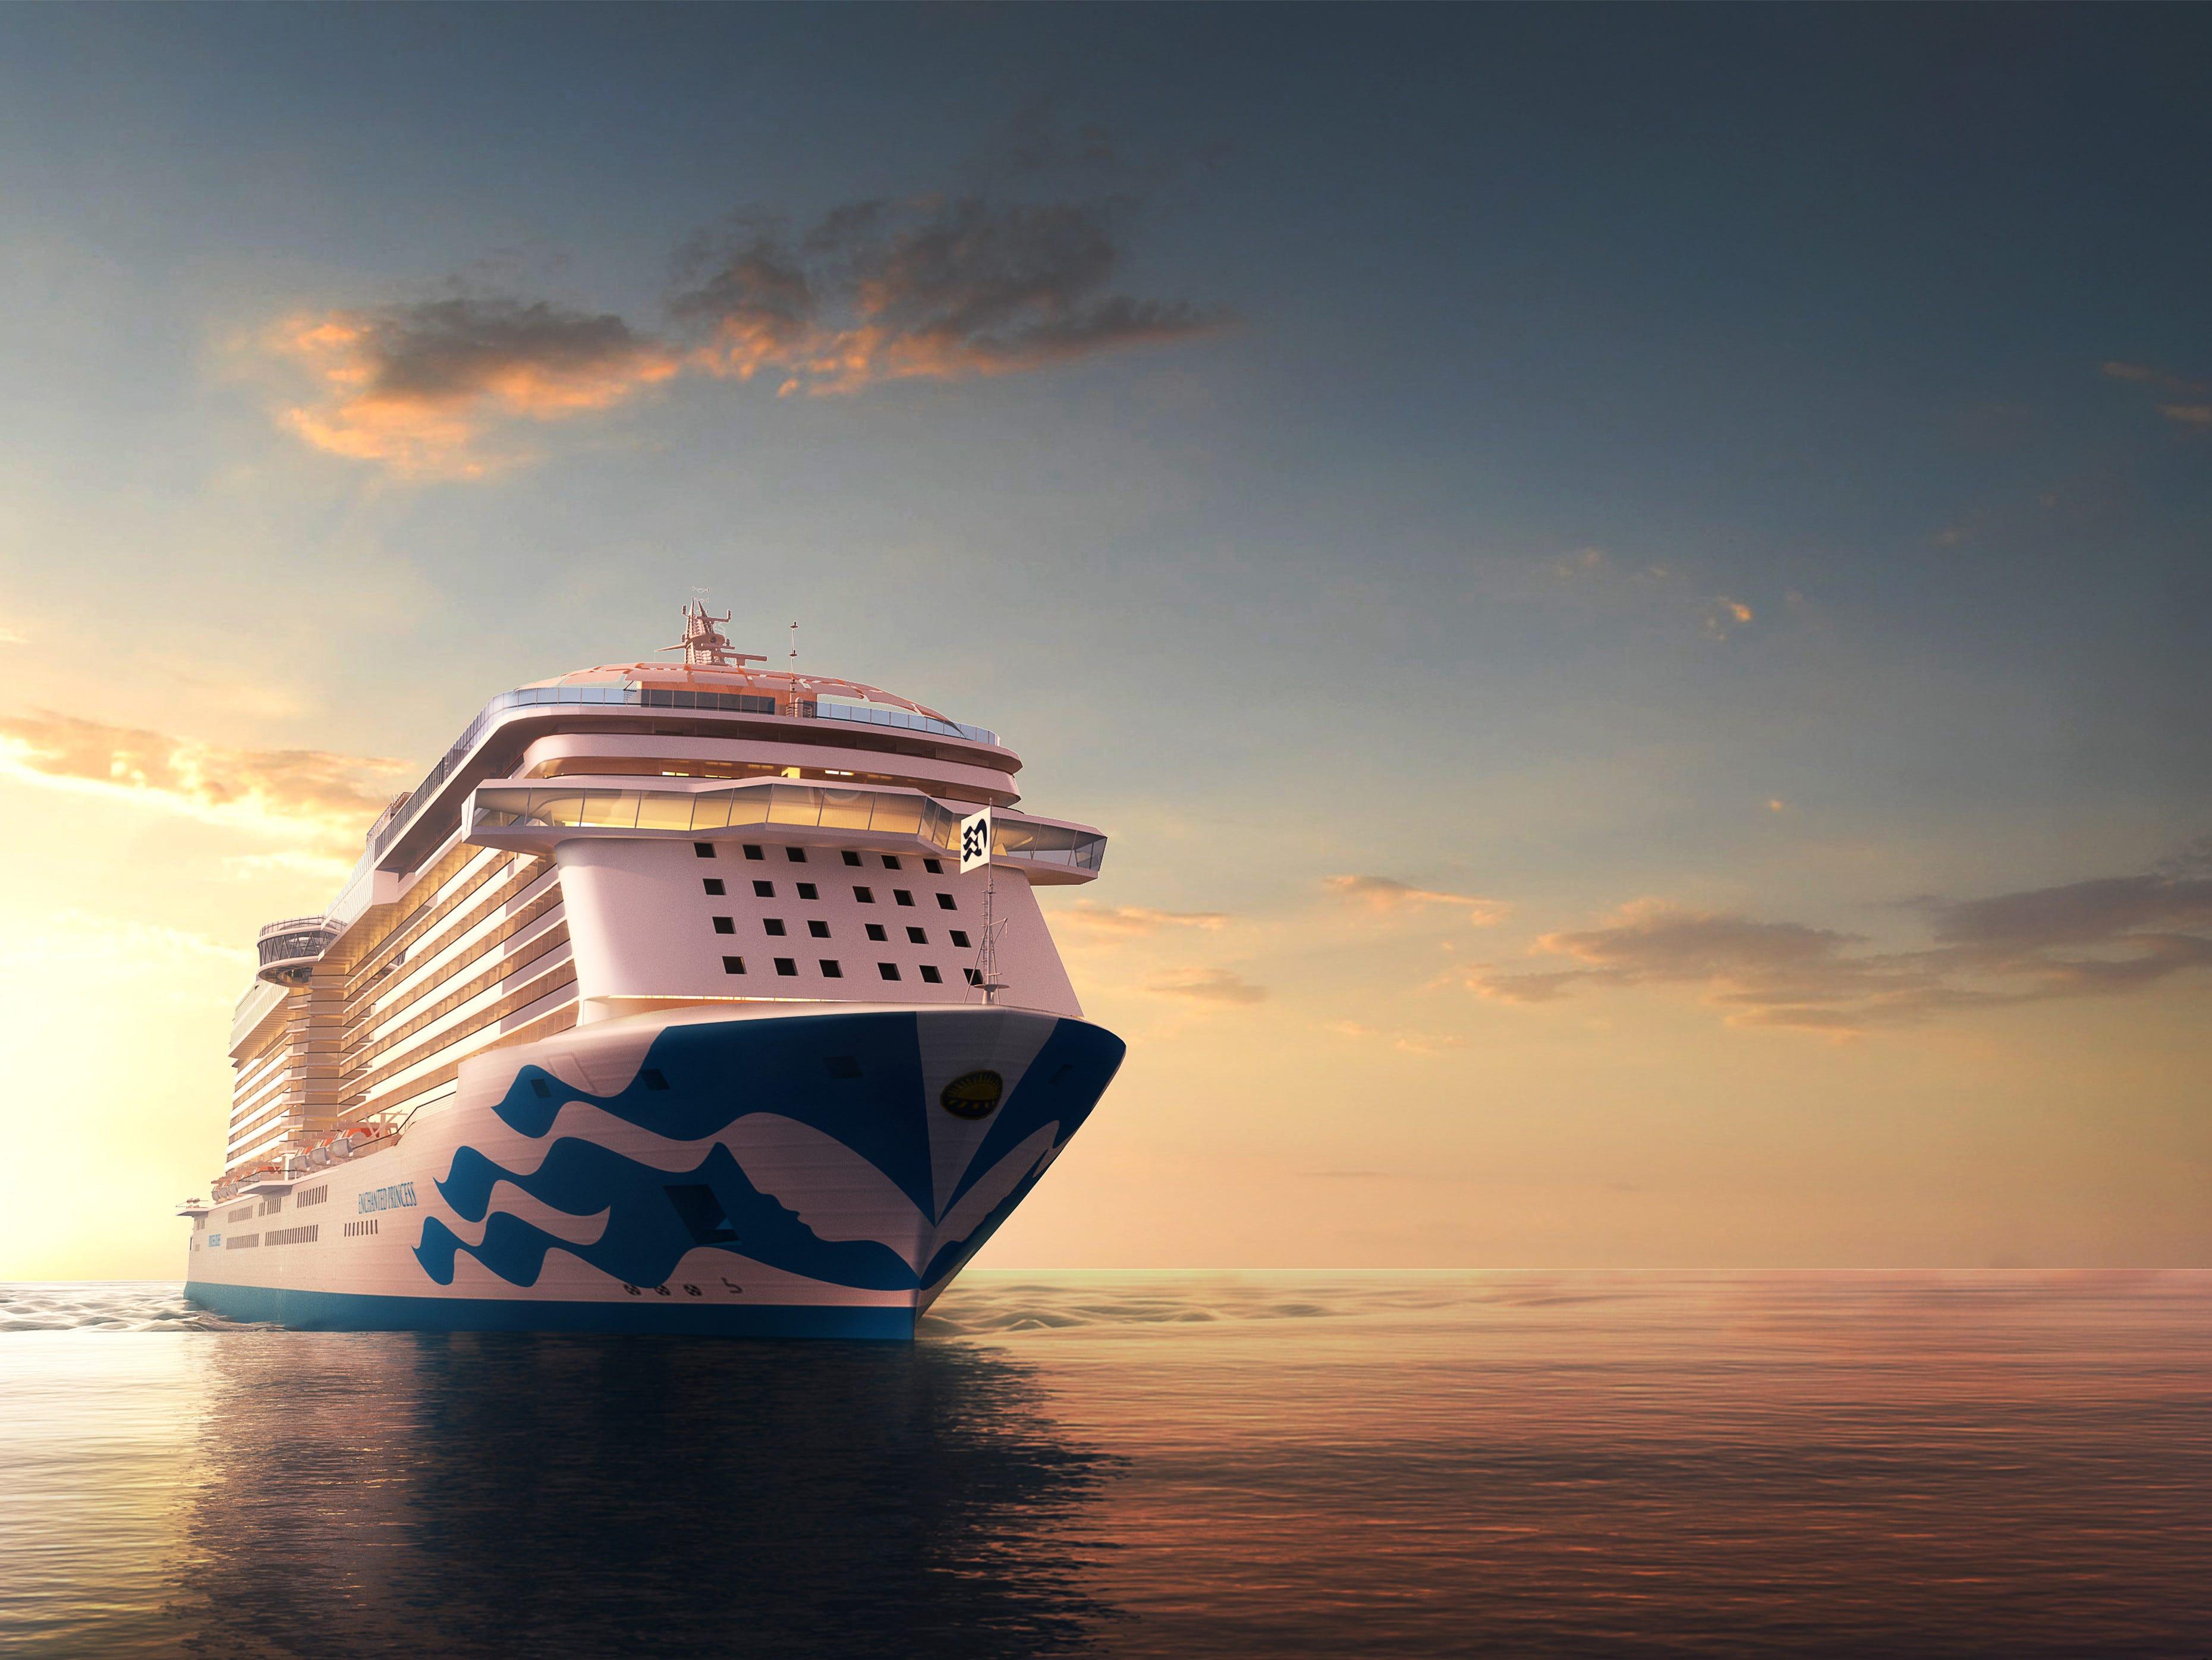 Sky Princess will debut in October 2019.